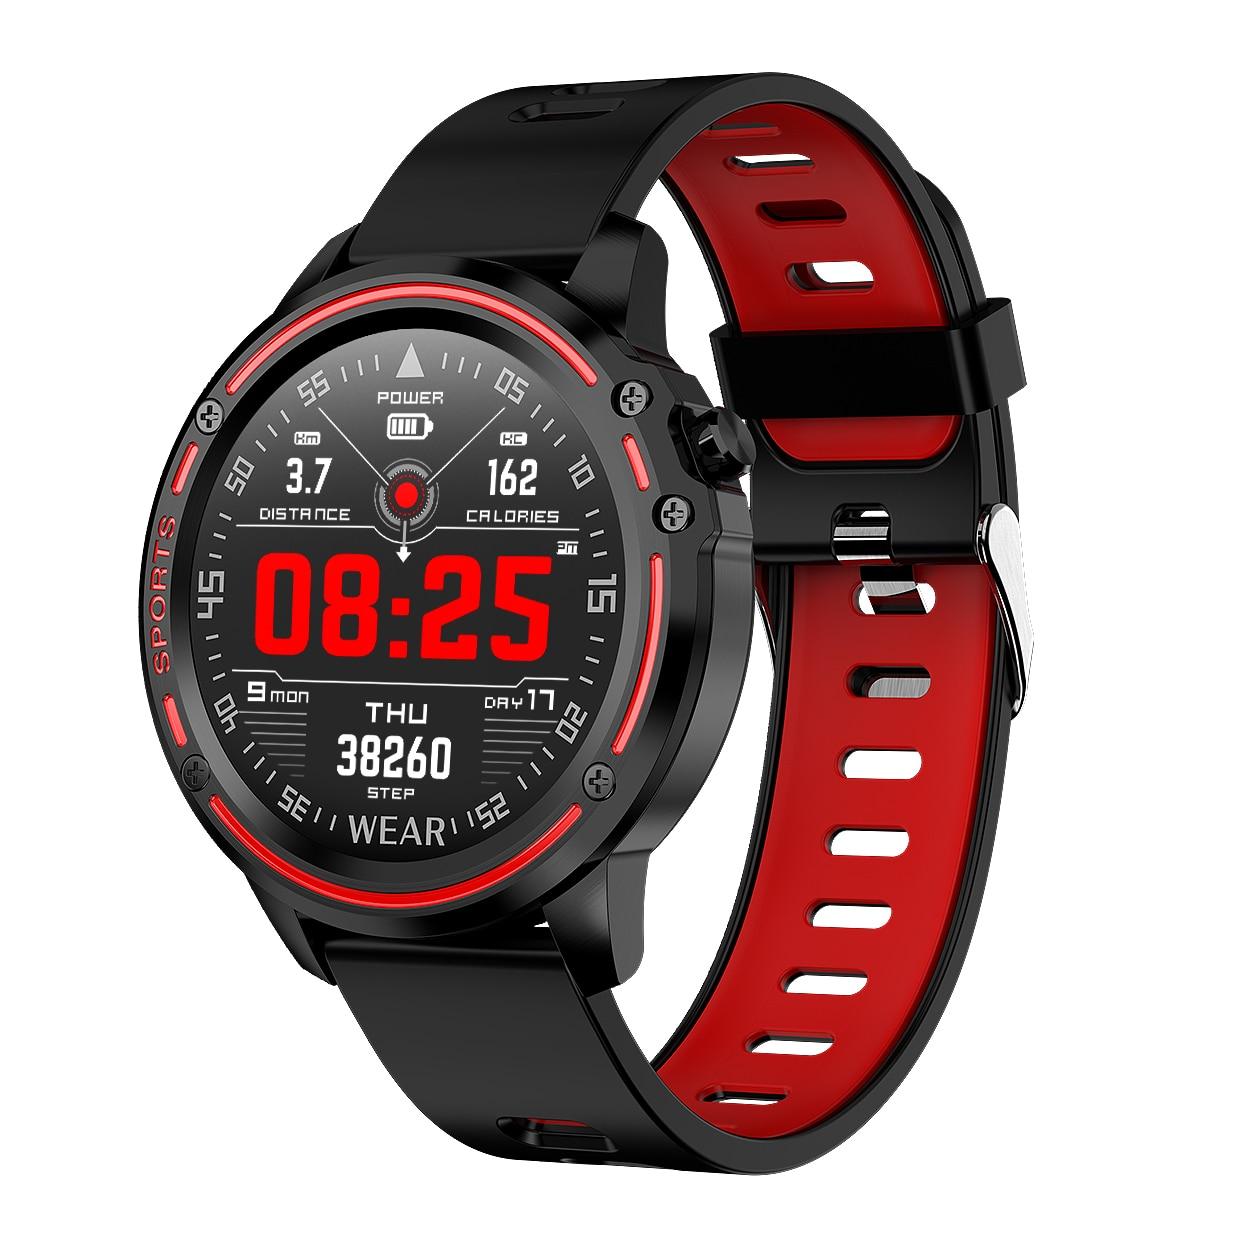 2020 L8 P3 Nieuwe 5G Bluetooth Betaling Card Nfc Horloge Amazfit Gtr Lite Amazifit Uhren Herren Amazifit Gts Kol saati Pulseira Smart